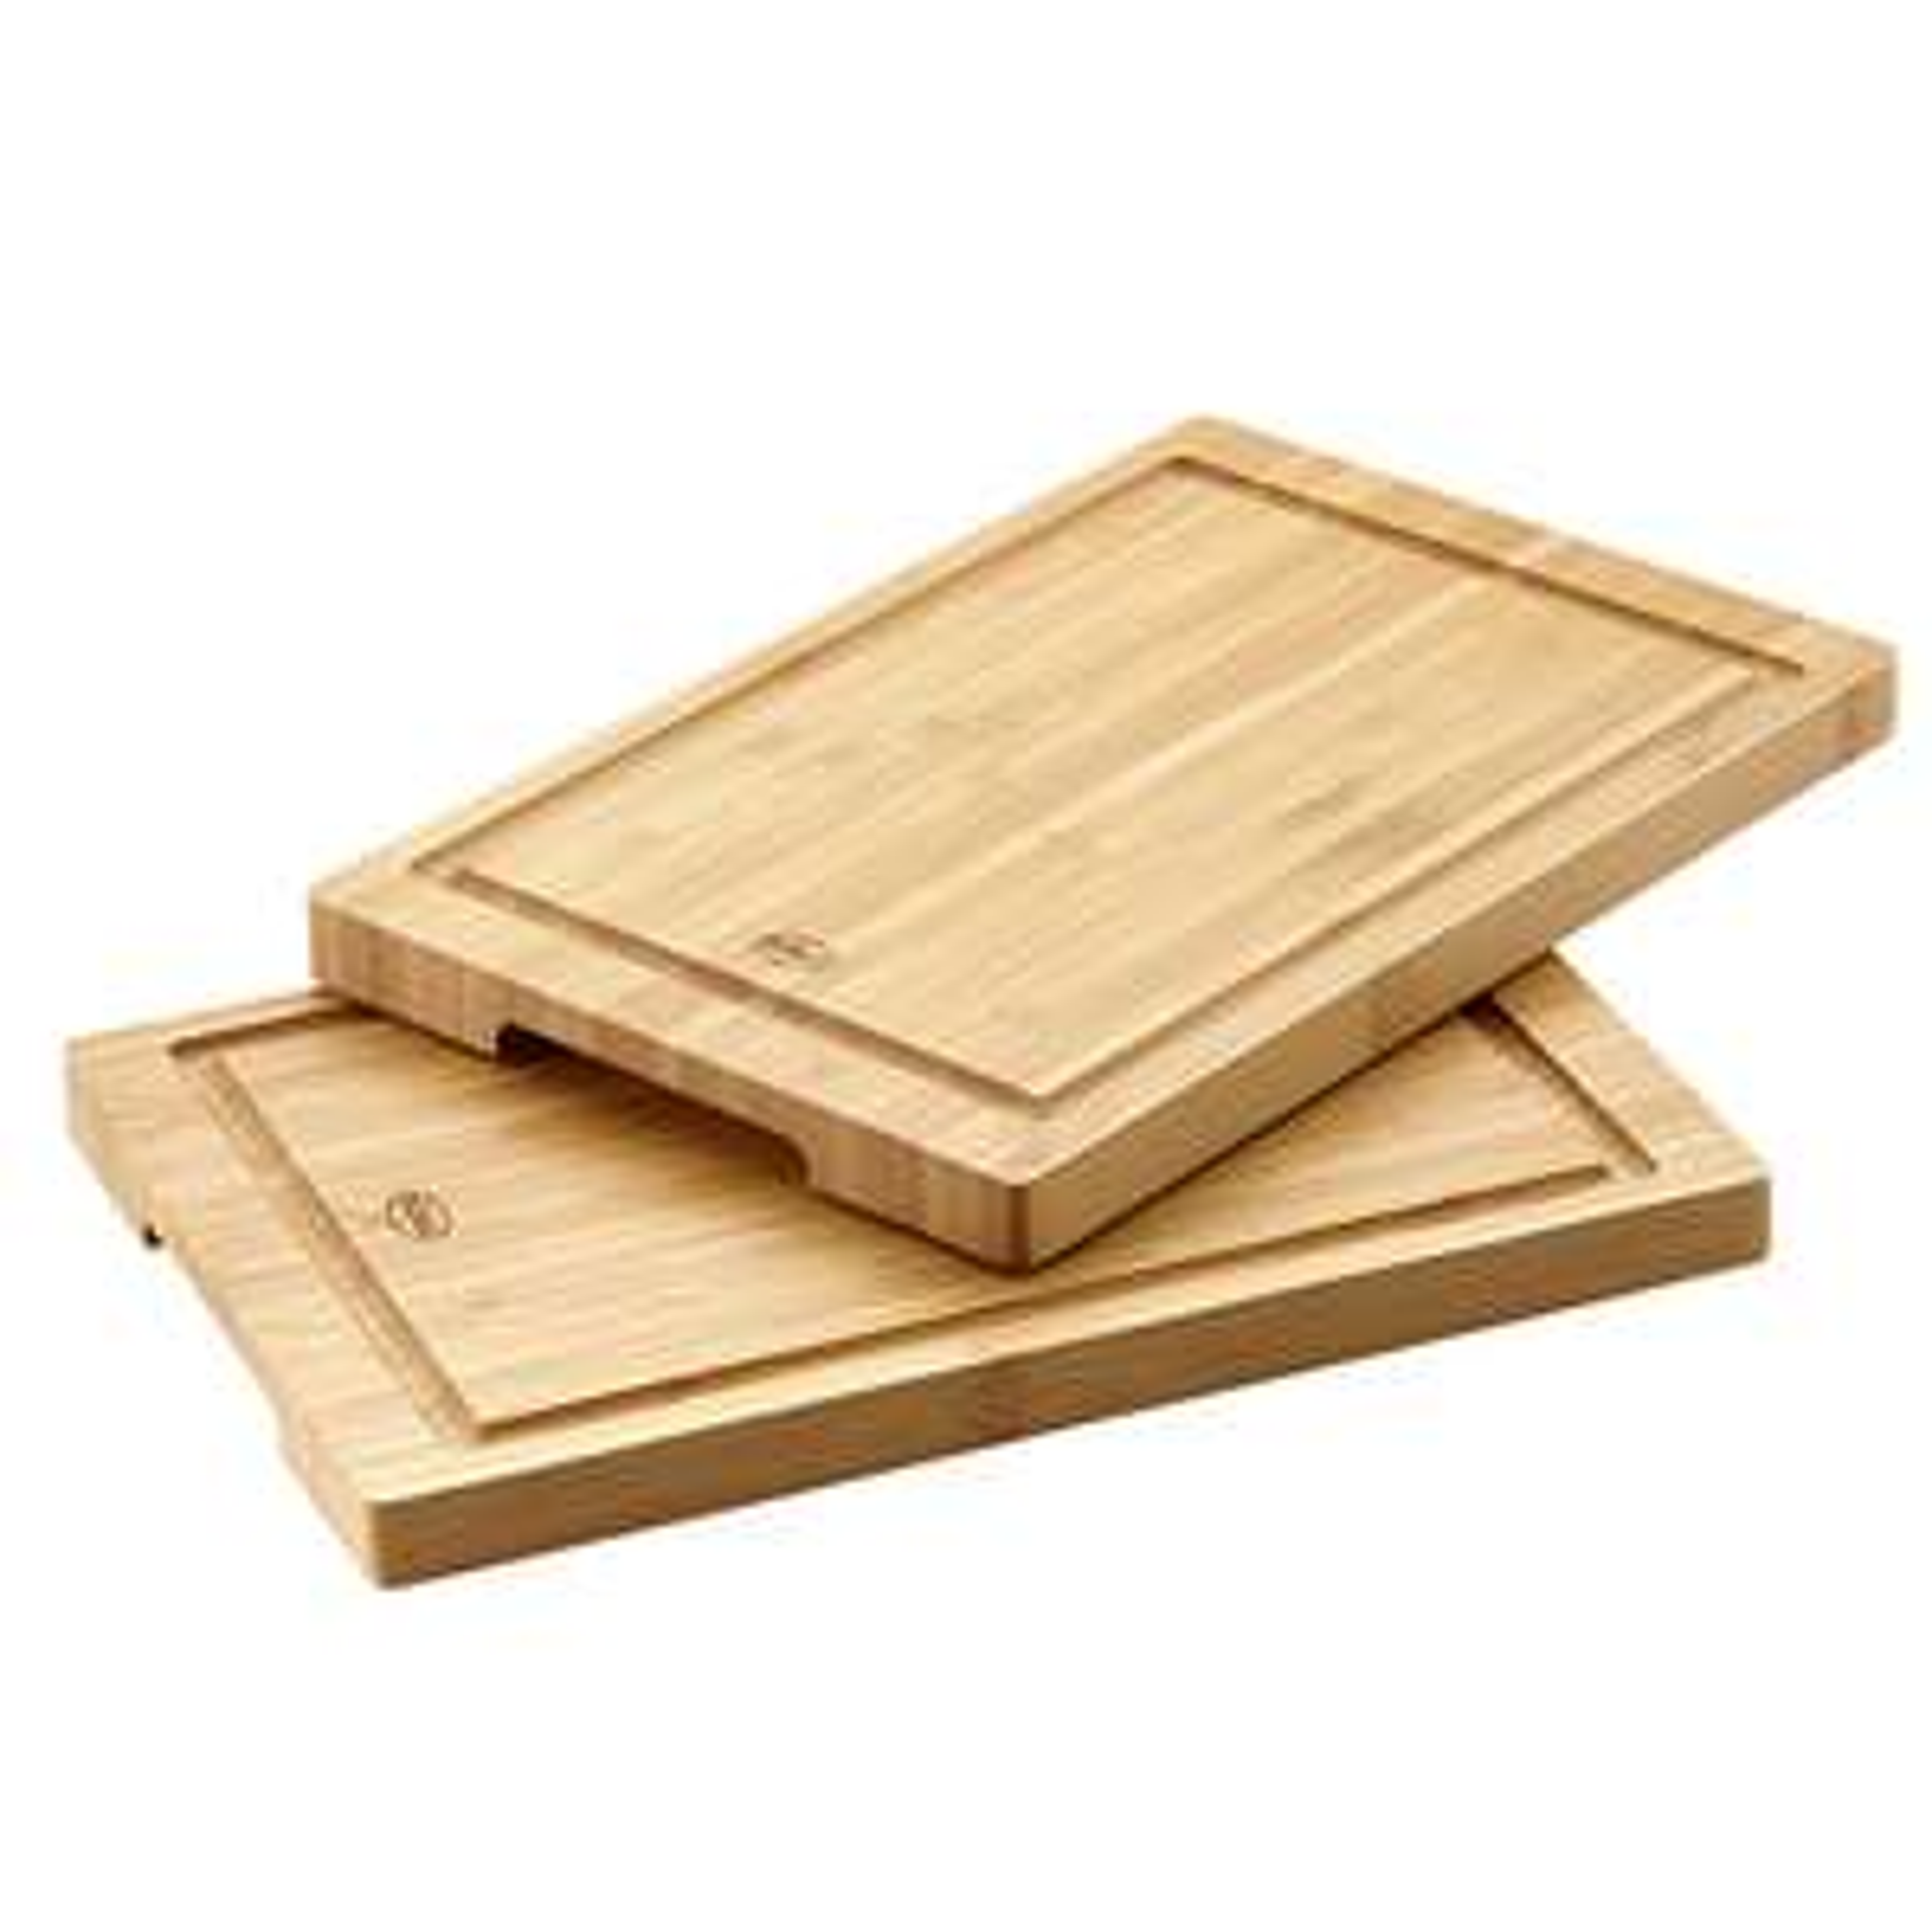 [penny vor Ort] Rösle Schneidbrett 2er Set Bambus 30 x 20 cm